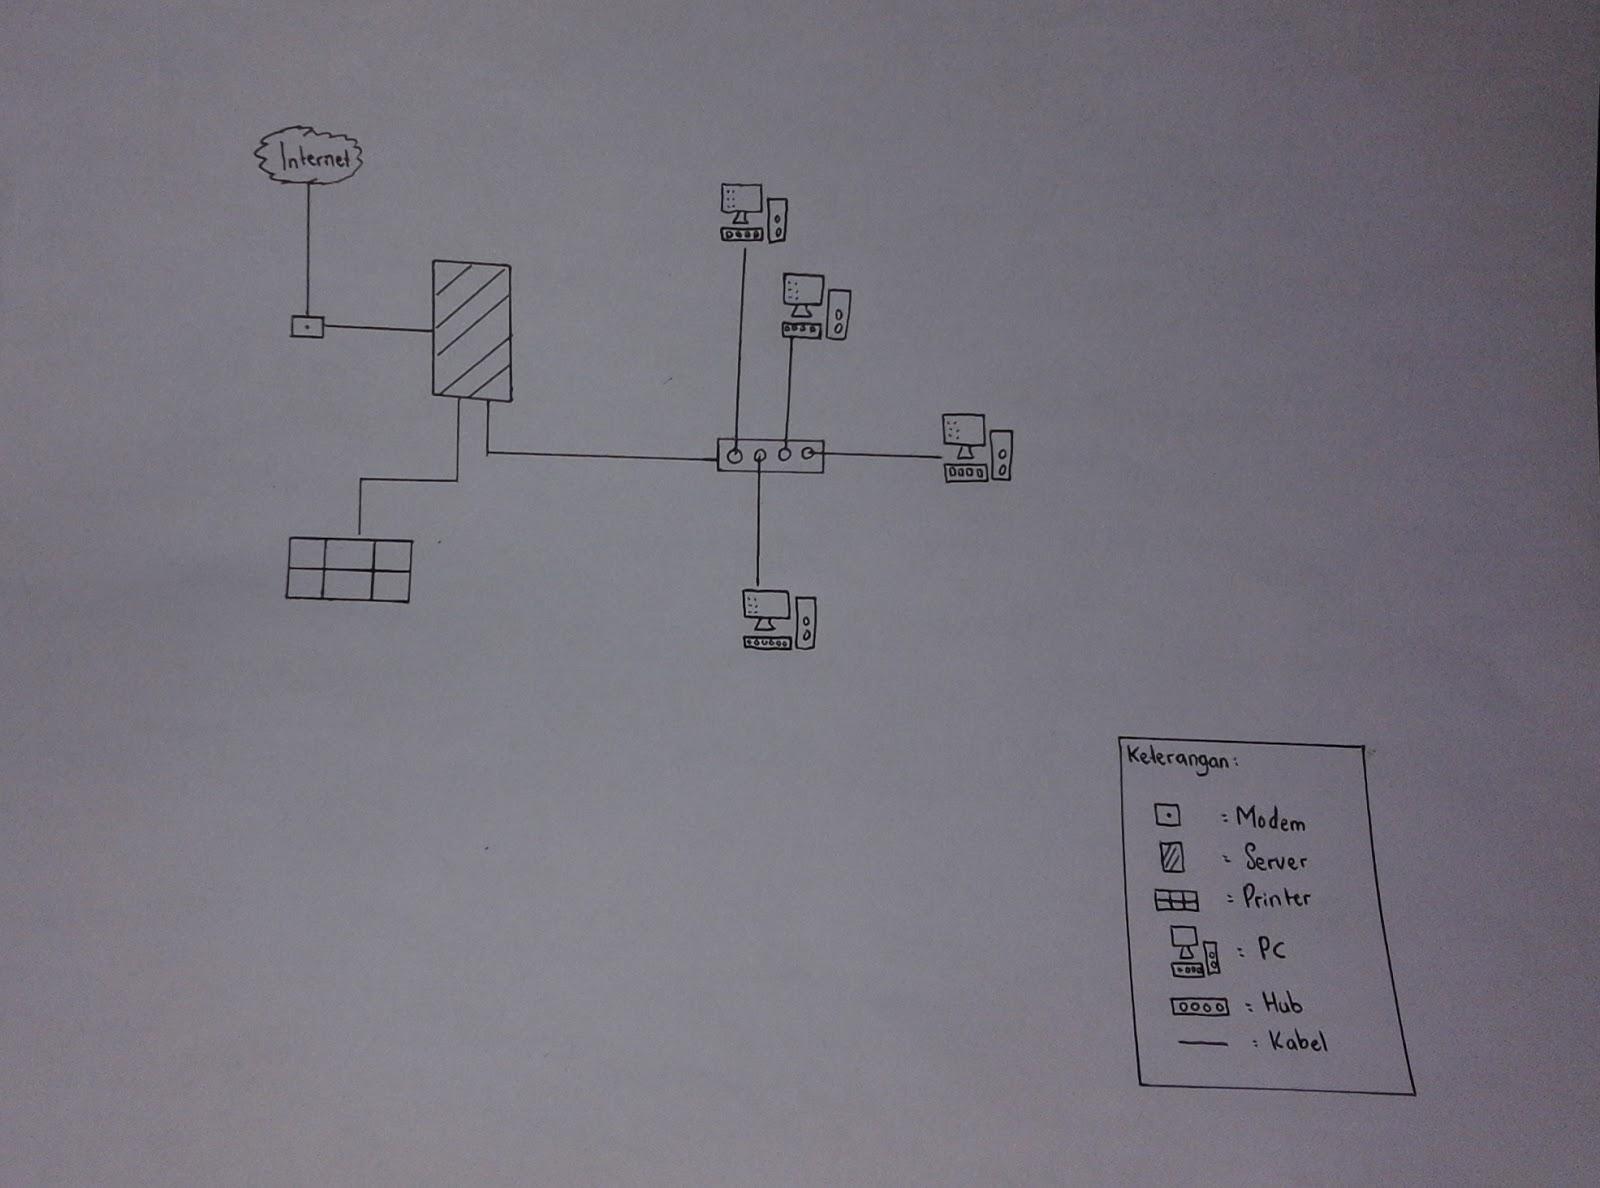 X mm 1 skema jaringan lan dan jaringan man skema sederhana jaringan lan ccuart Gallery